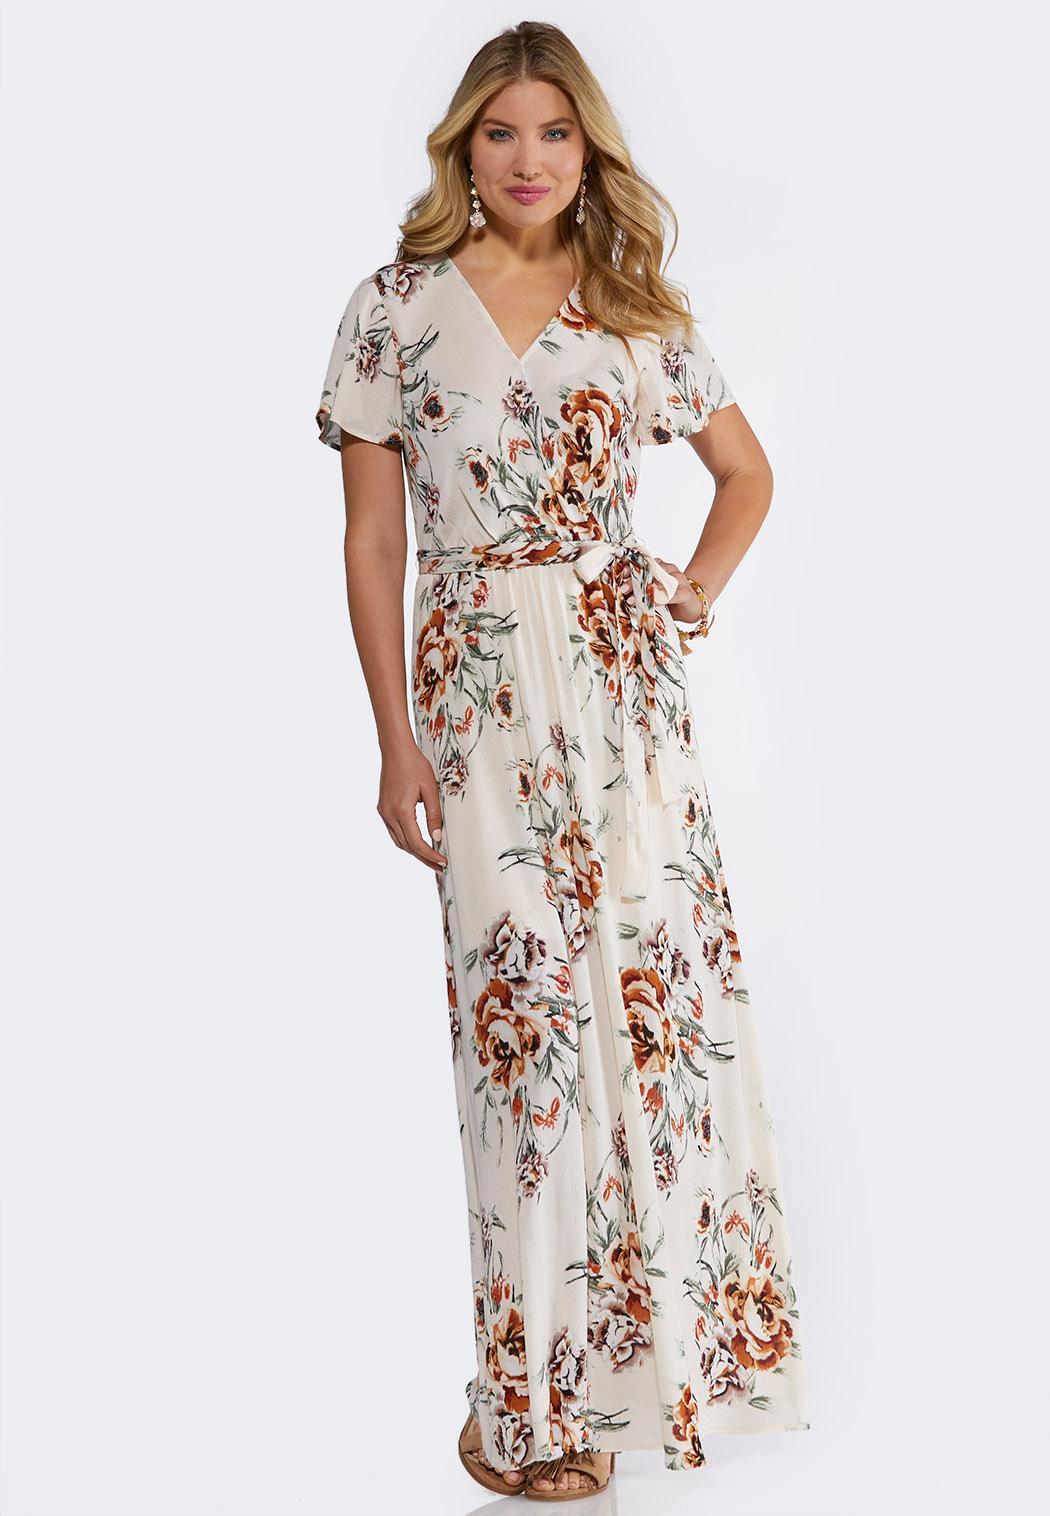 b6ad60d471322 Plus Size Ivory Floral Maxi Dress Dresses Cato Fashions